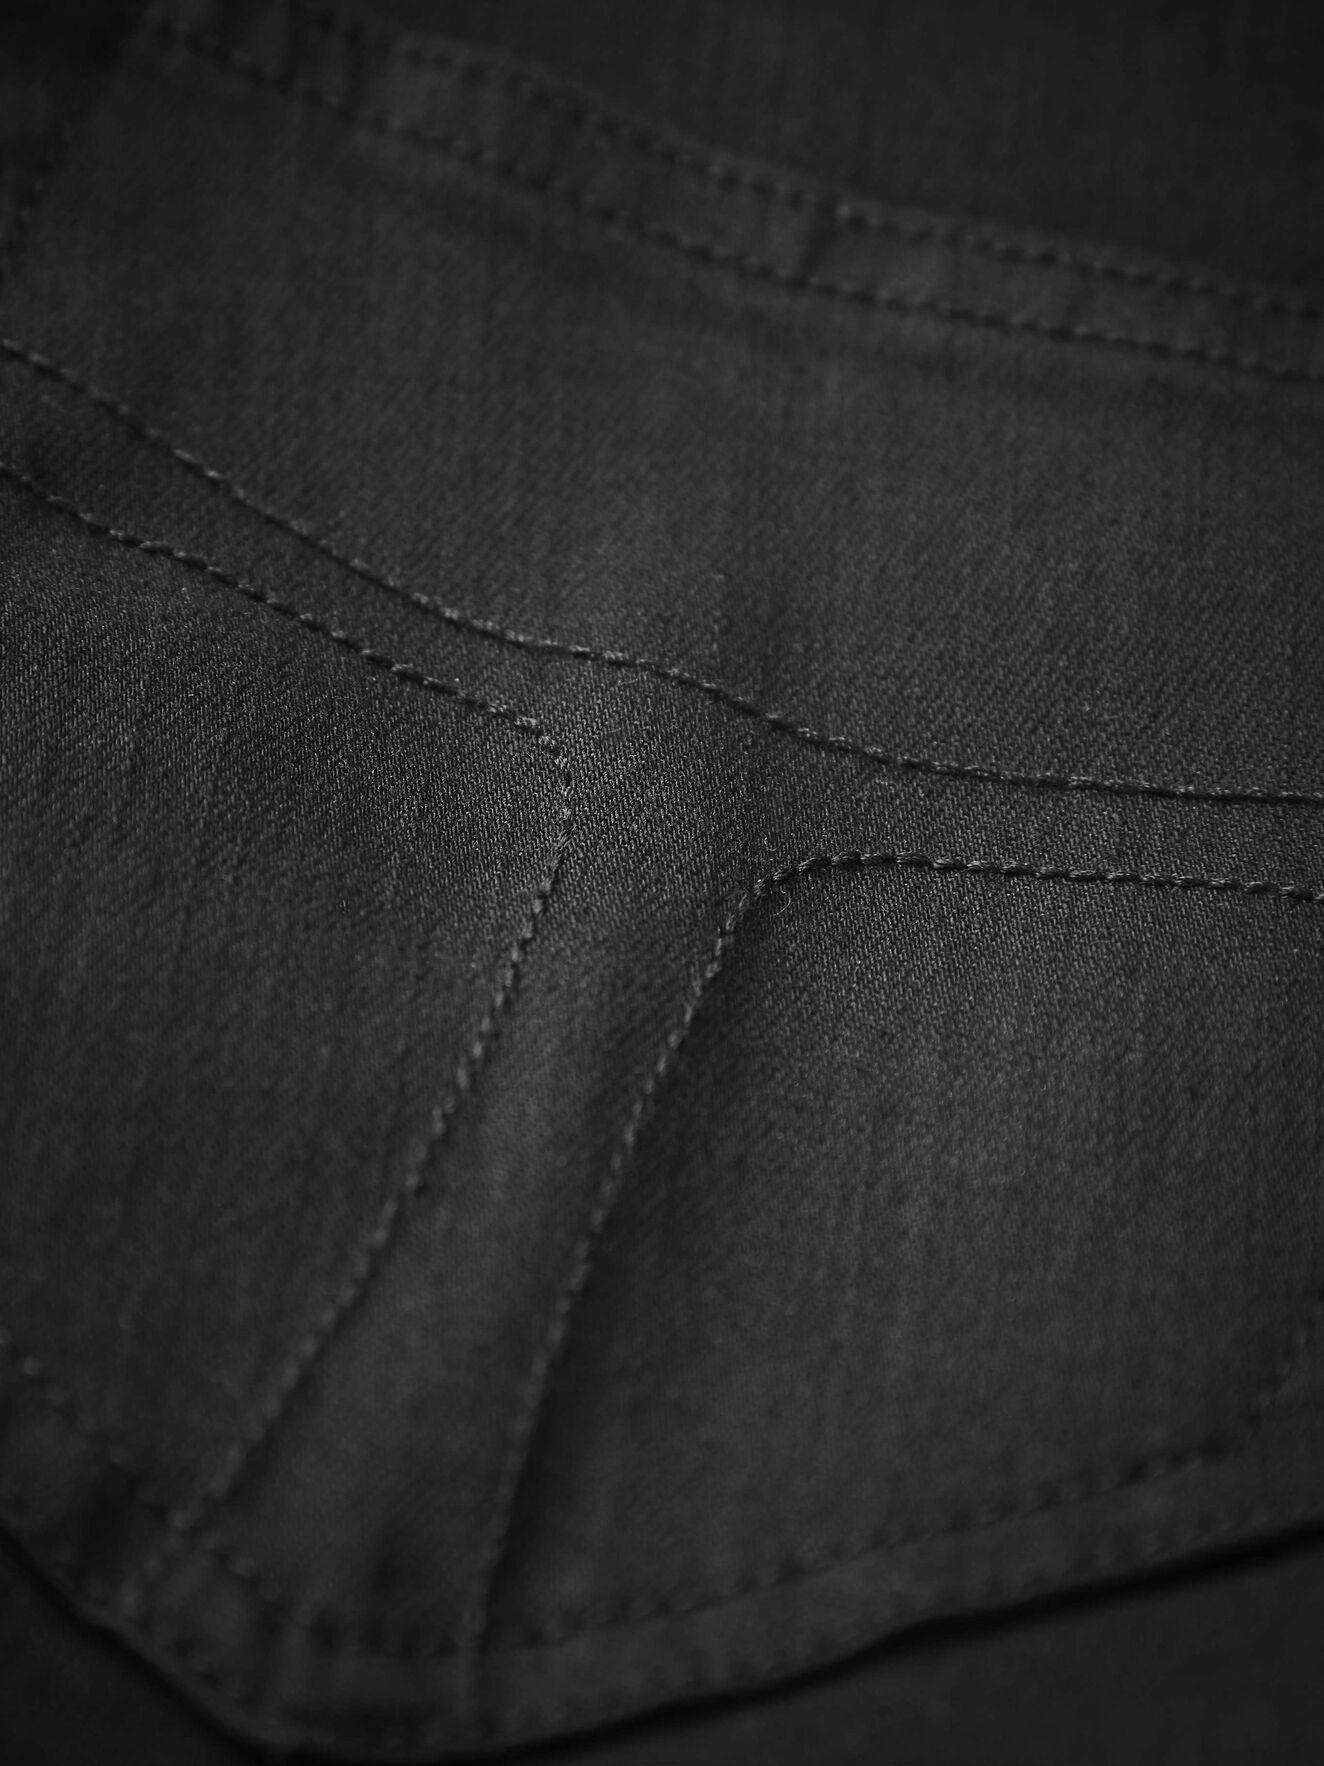 Slight Jeans in Black from Tiger of Sweden